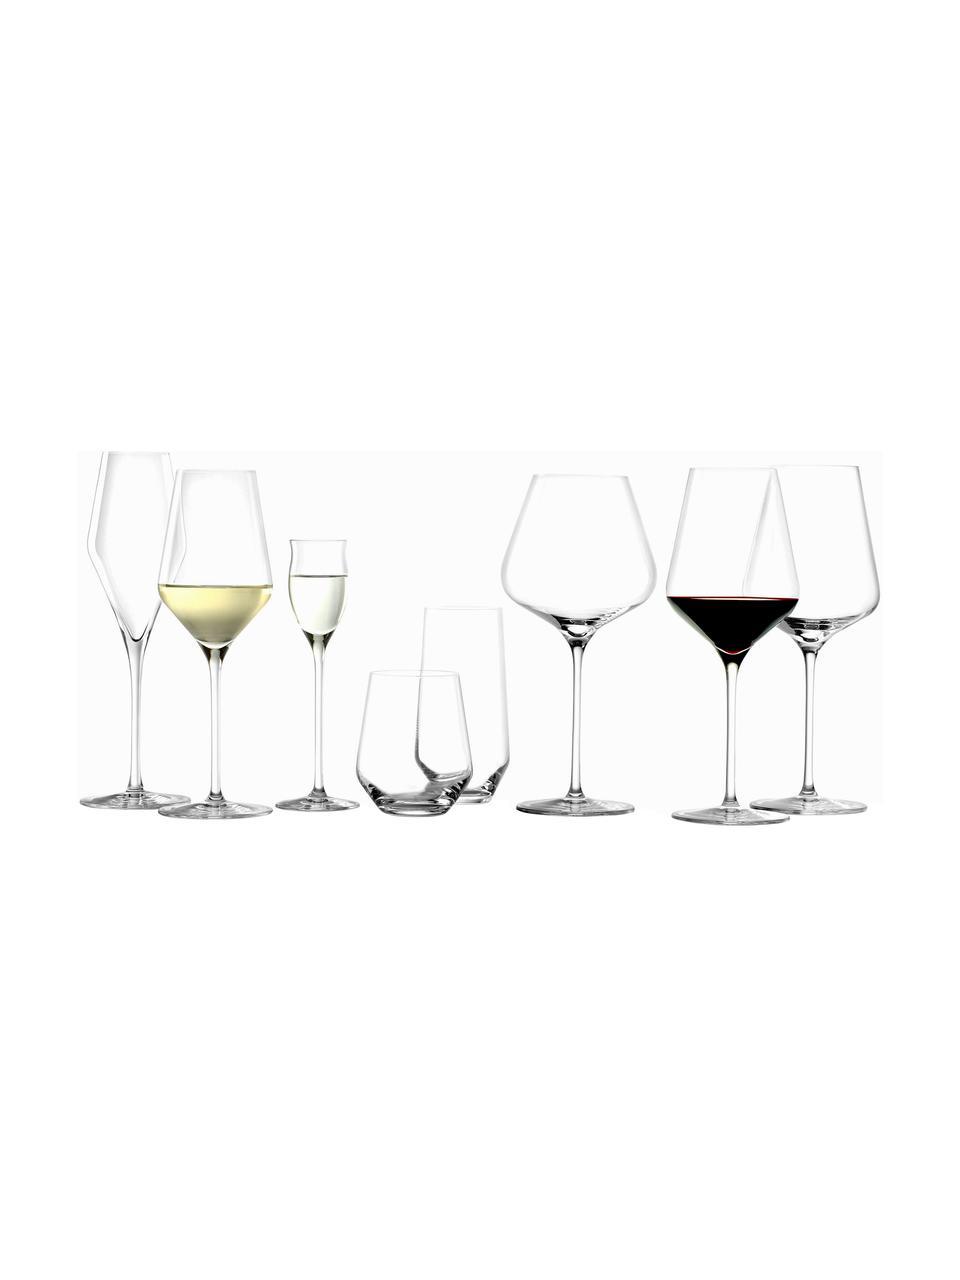 Hohe Kristallgläser Revolution, 6 Stück, Kristallglas, Transparent, Ø 7 x H 14 cm